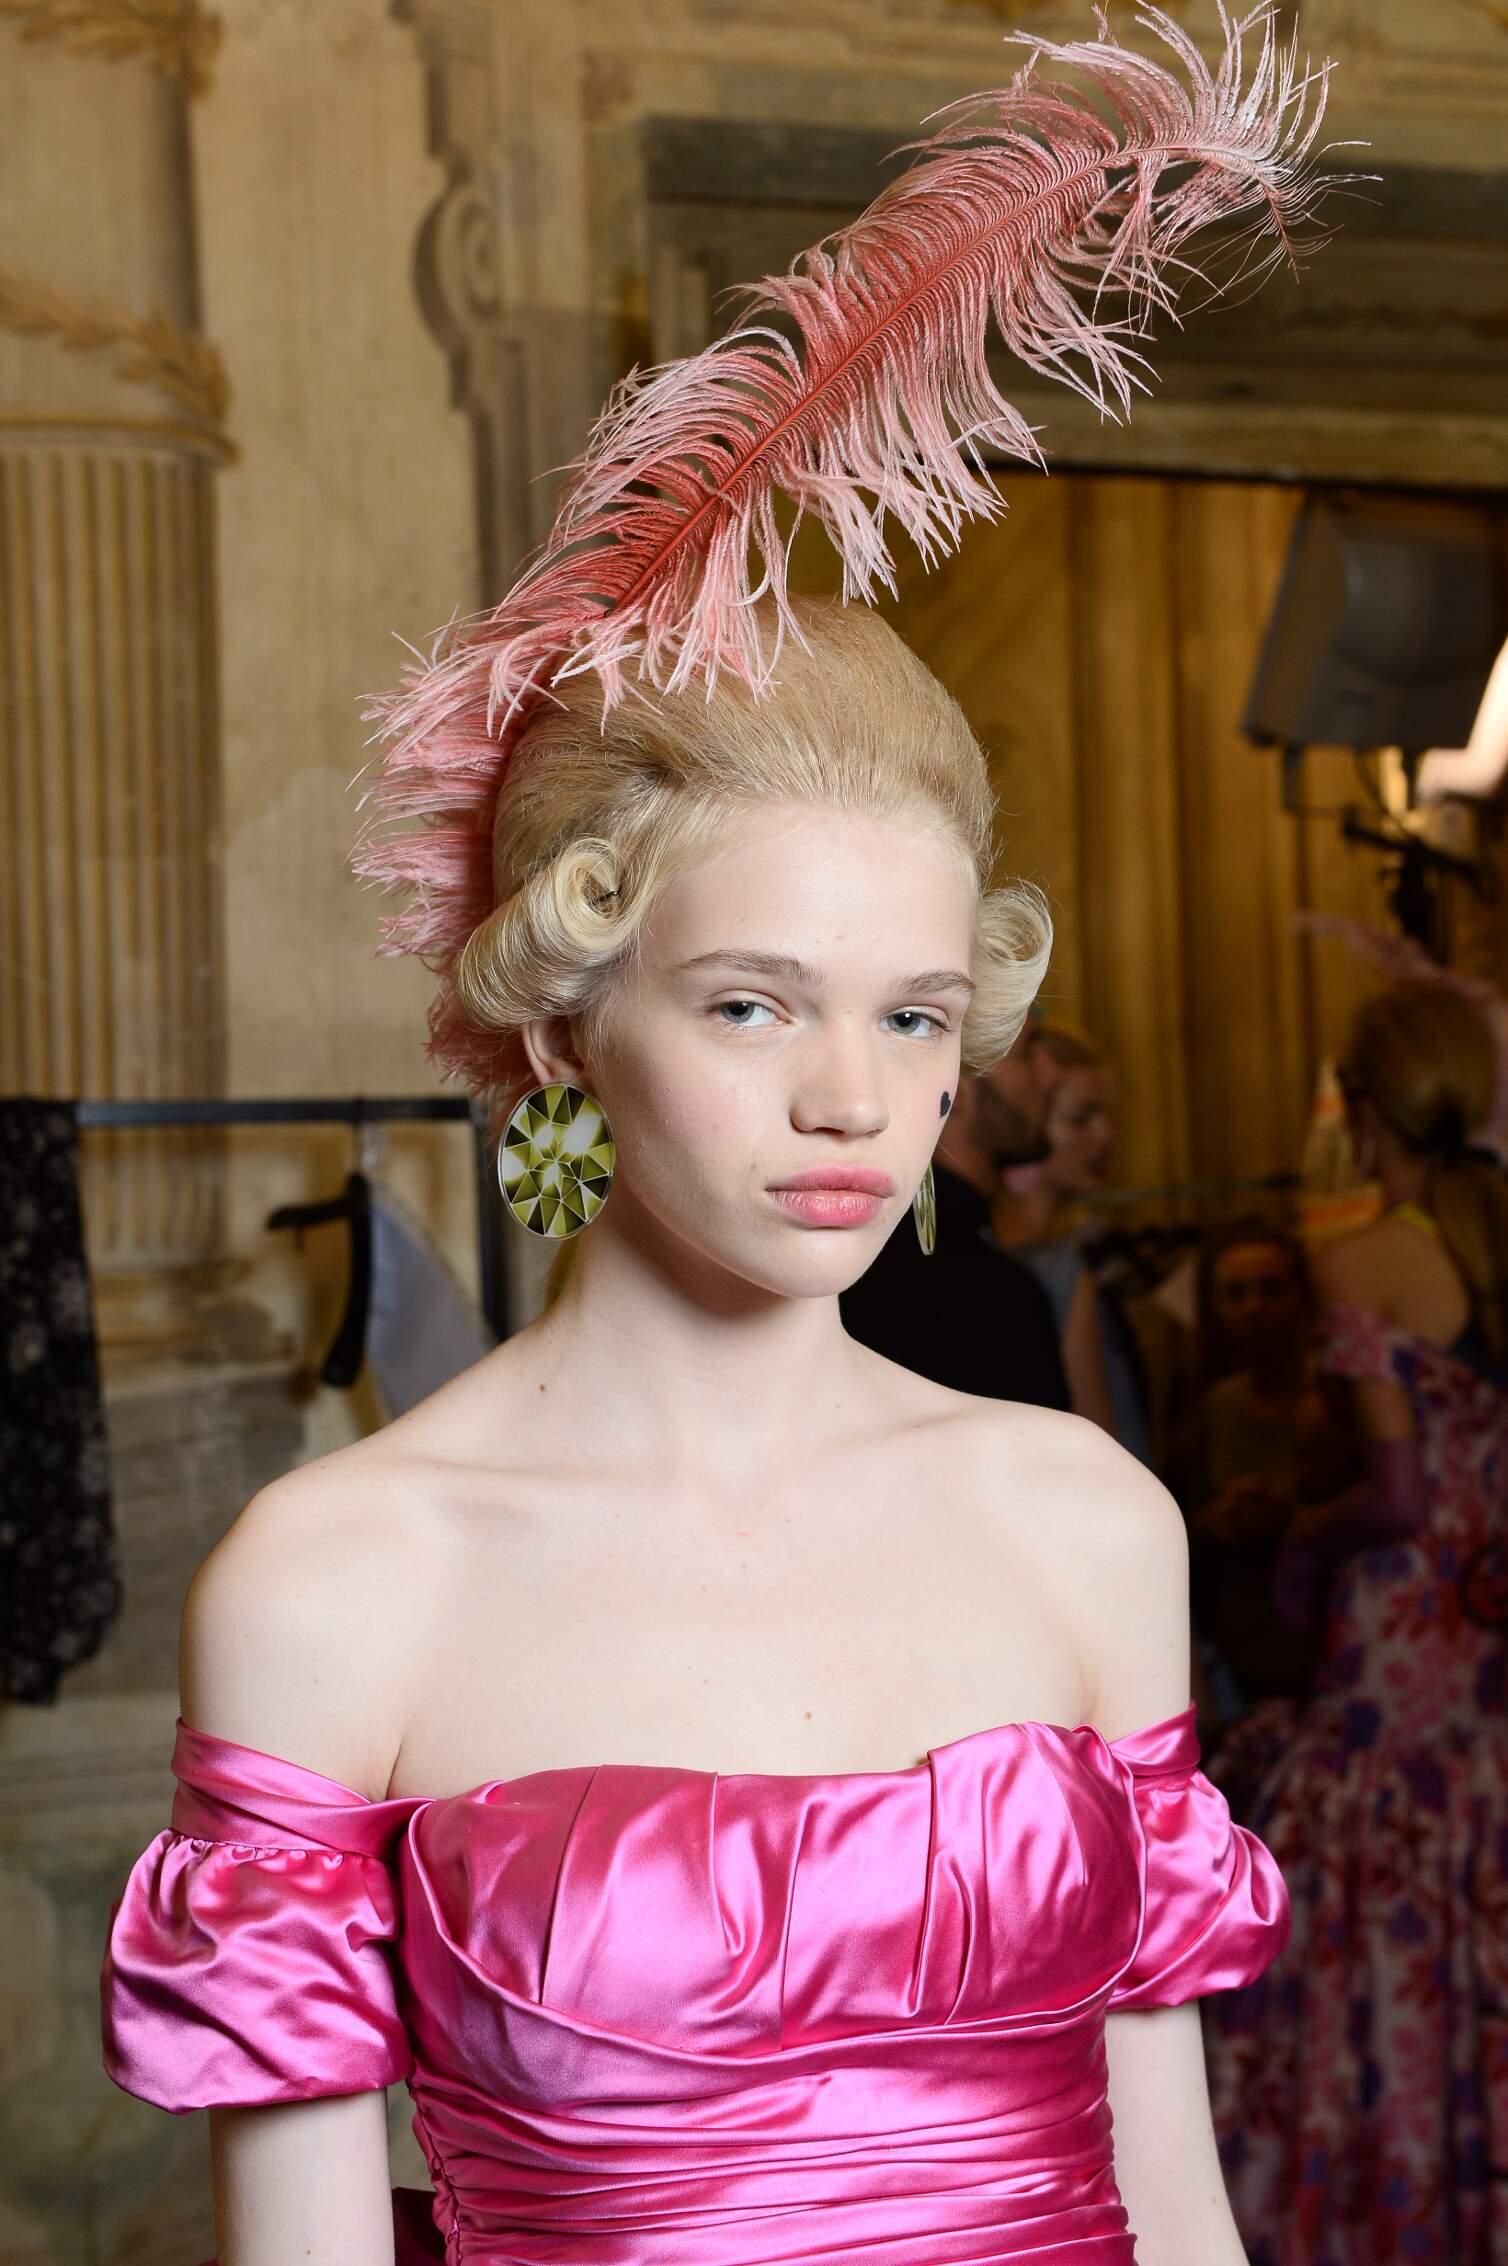 Backstage Moschino Fashion Show Portrait